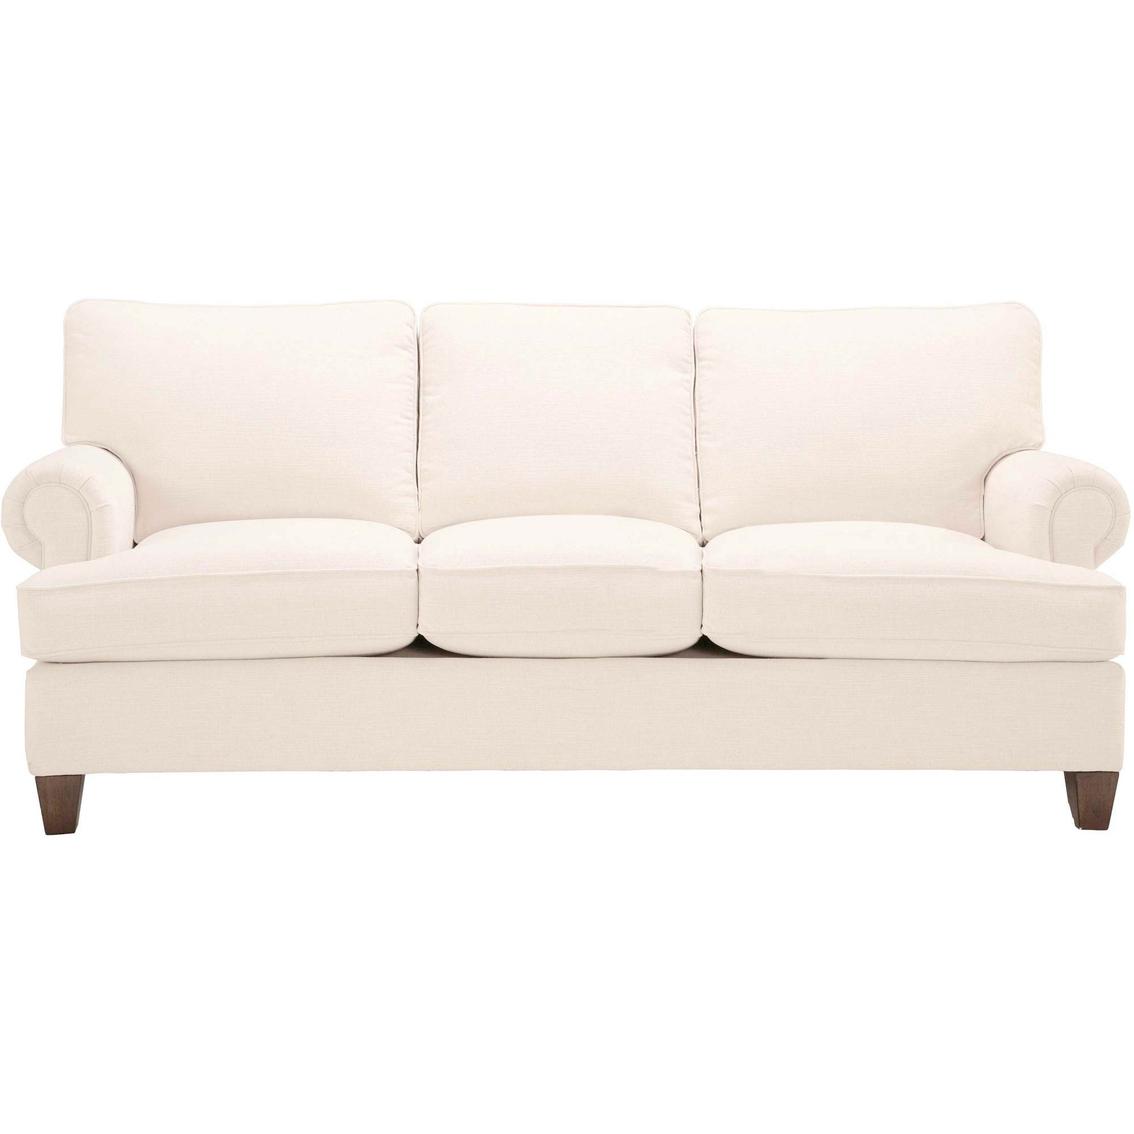 bassett sutherland sleeper sofa sofas loveseats home appliances shop the exchange